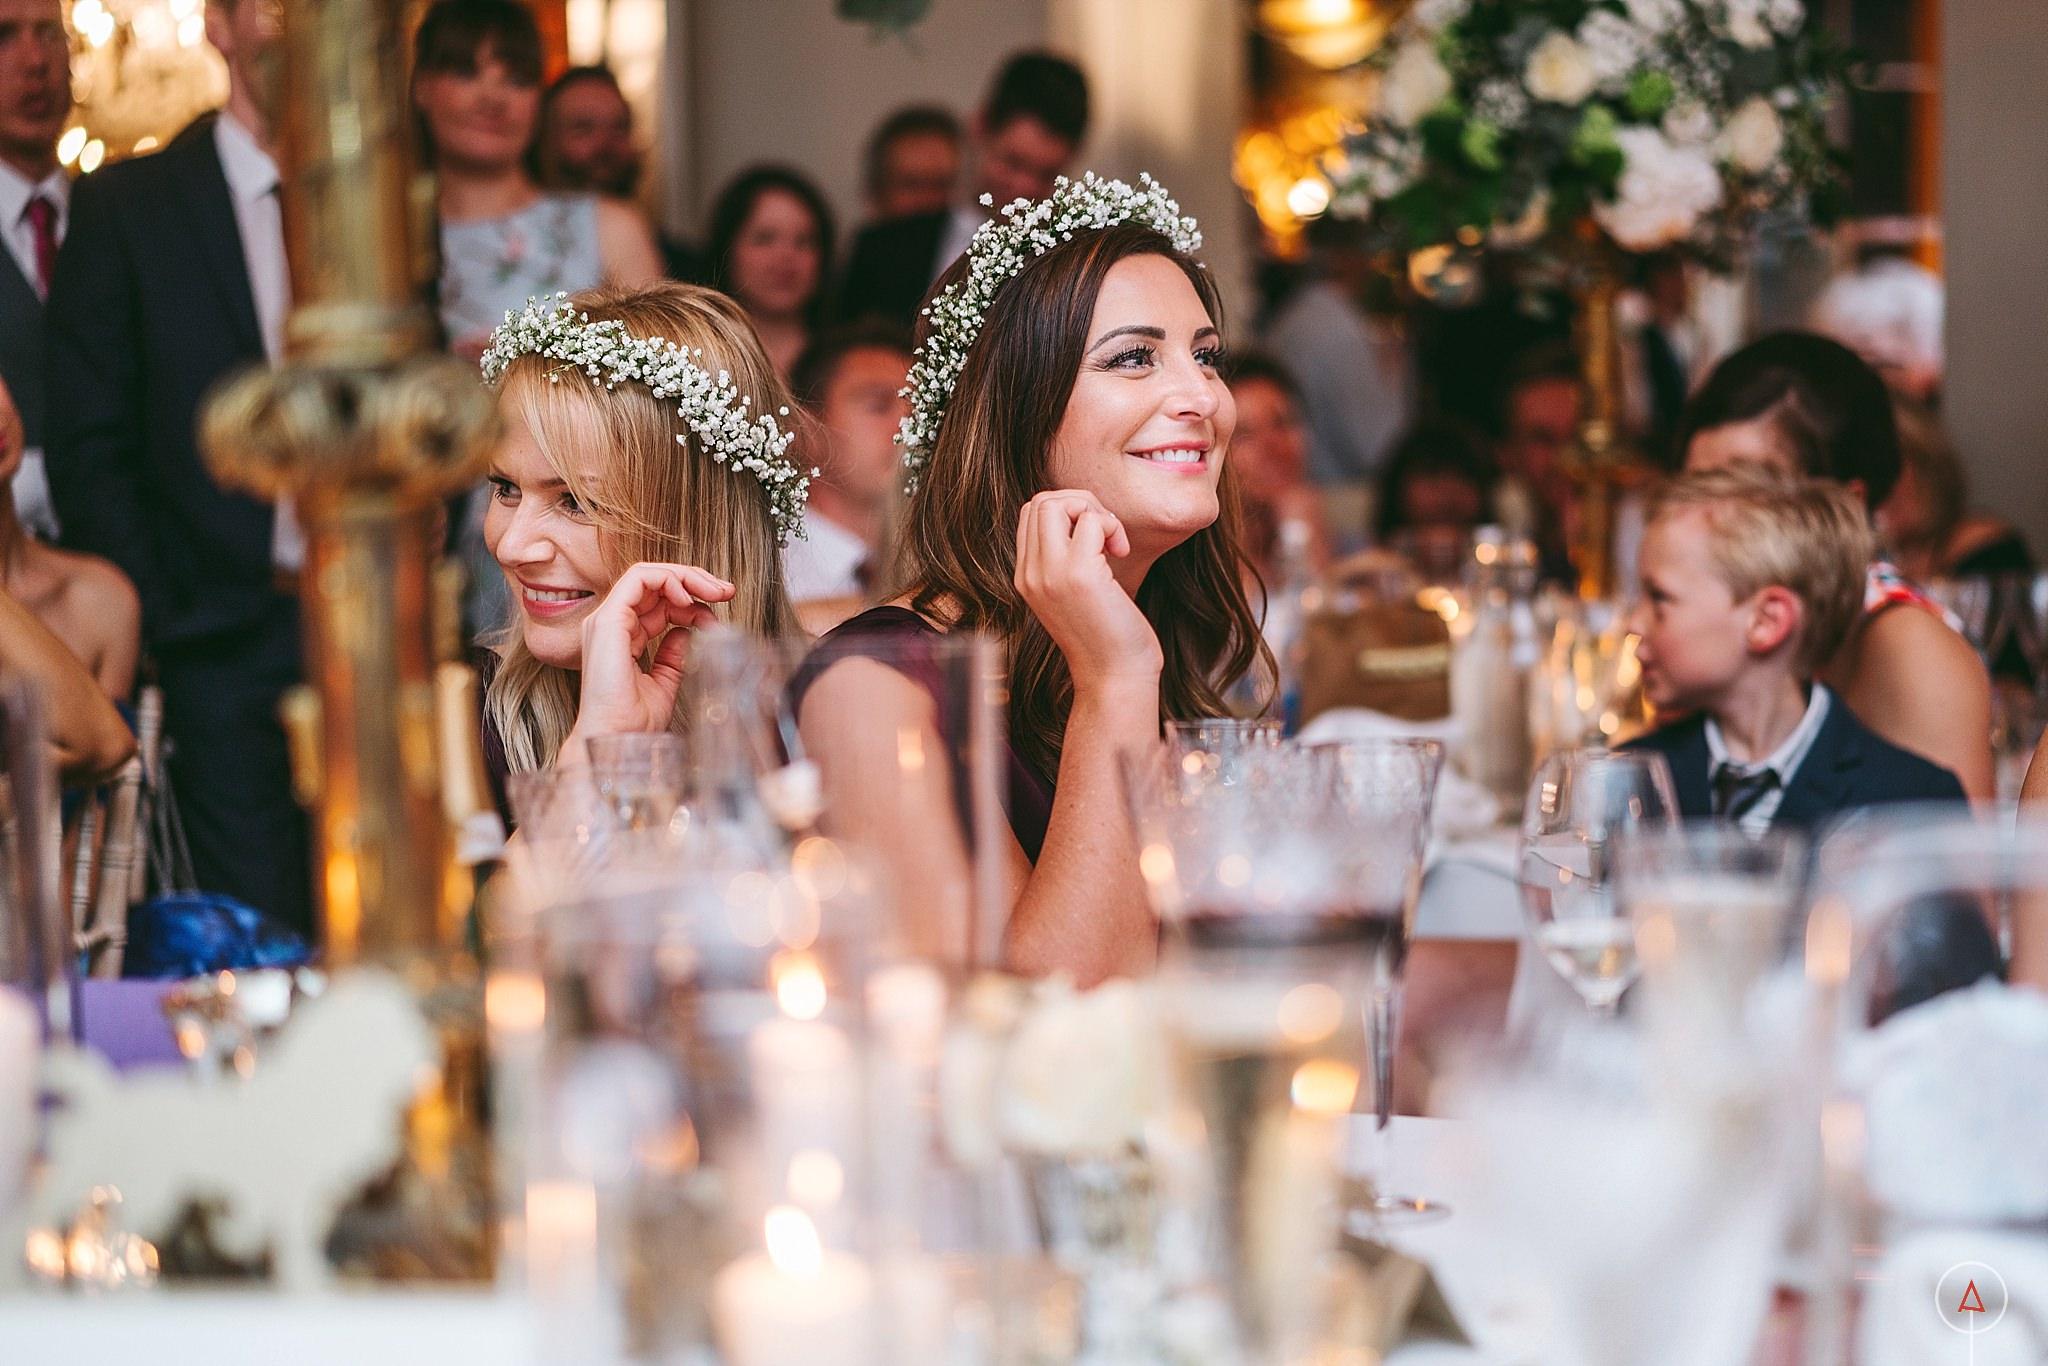 cardiff-wedding-photographer-aga-tomaszek_0304